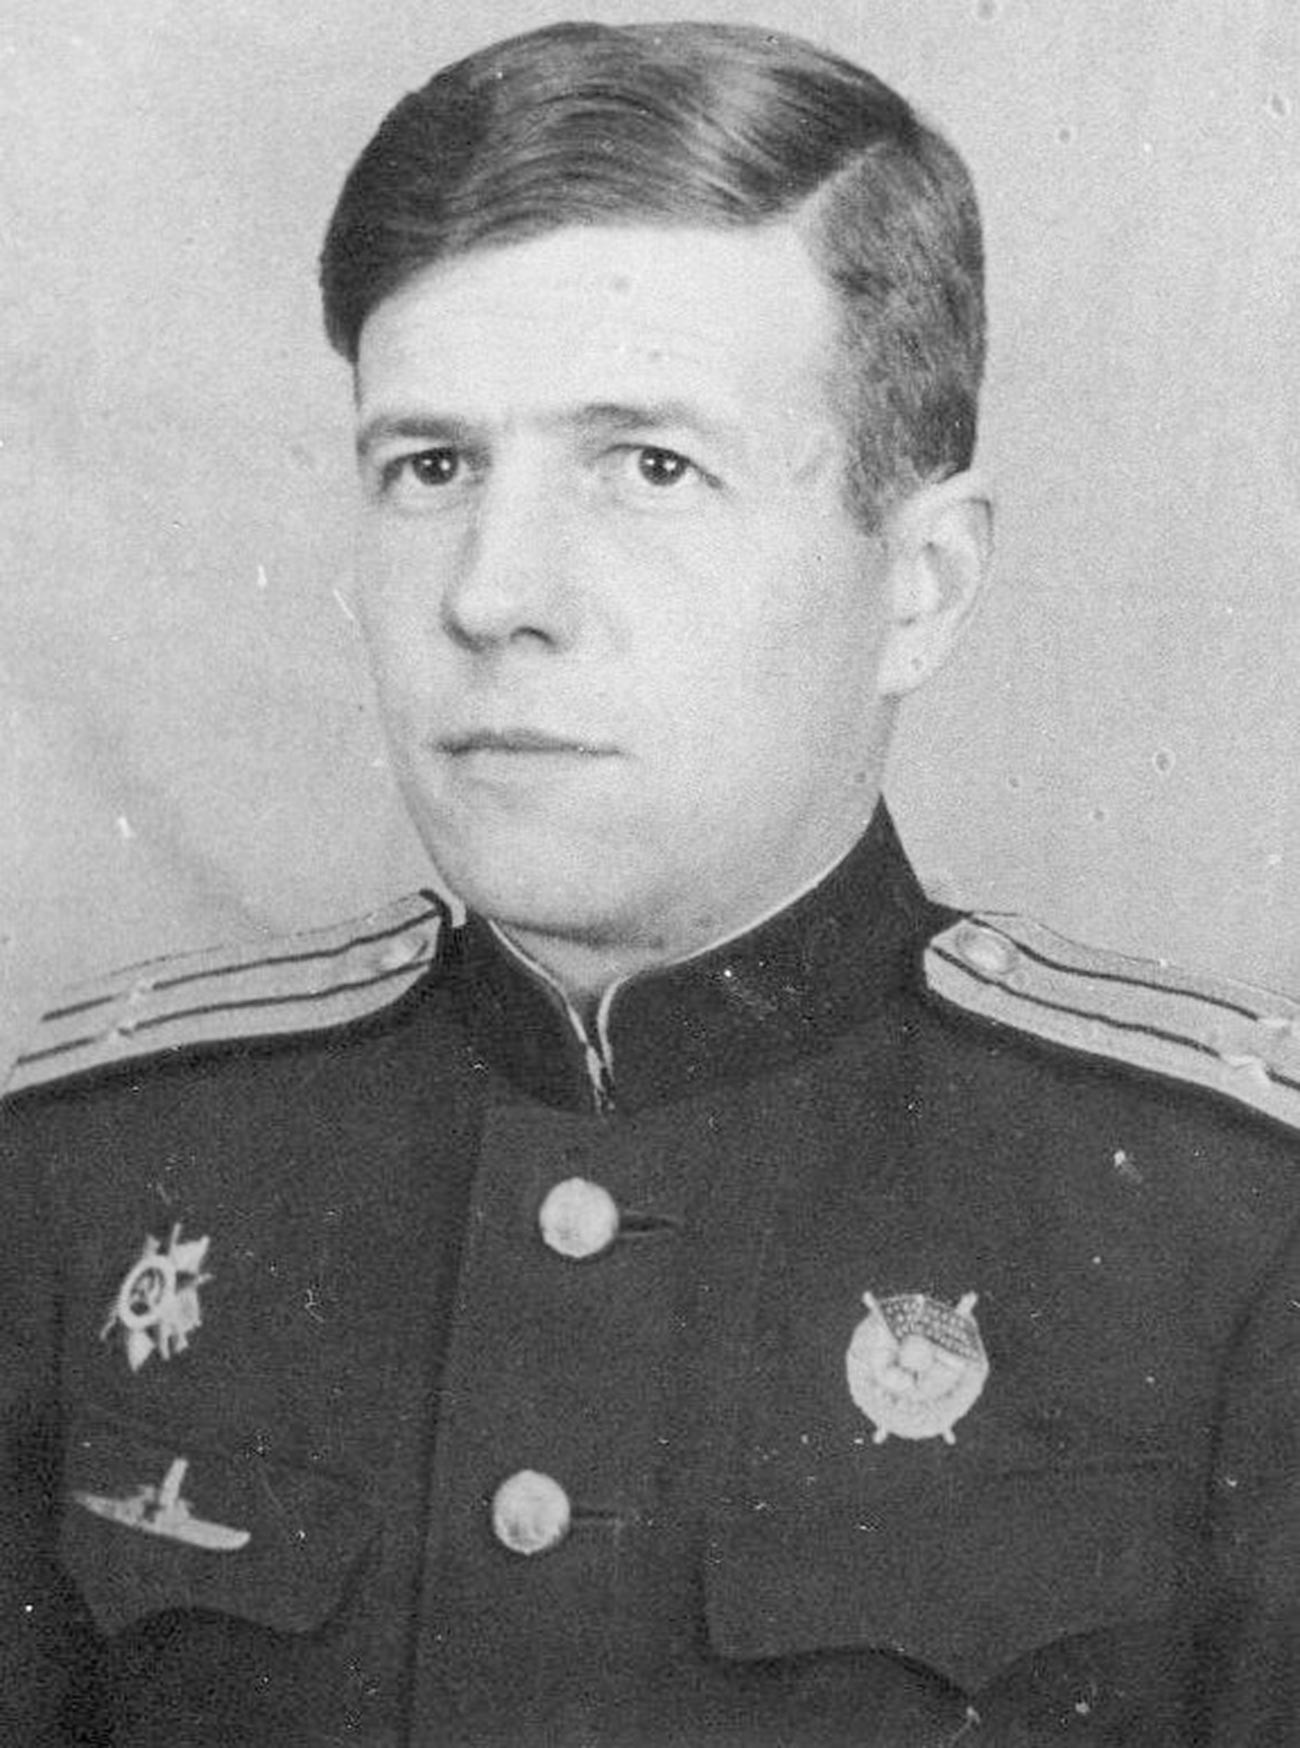 Mijaíl Avugustinovich